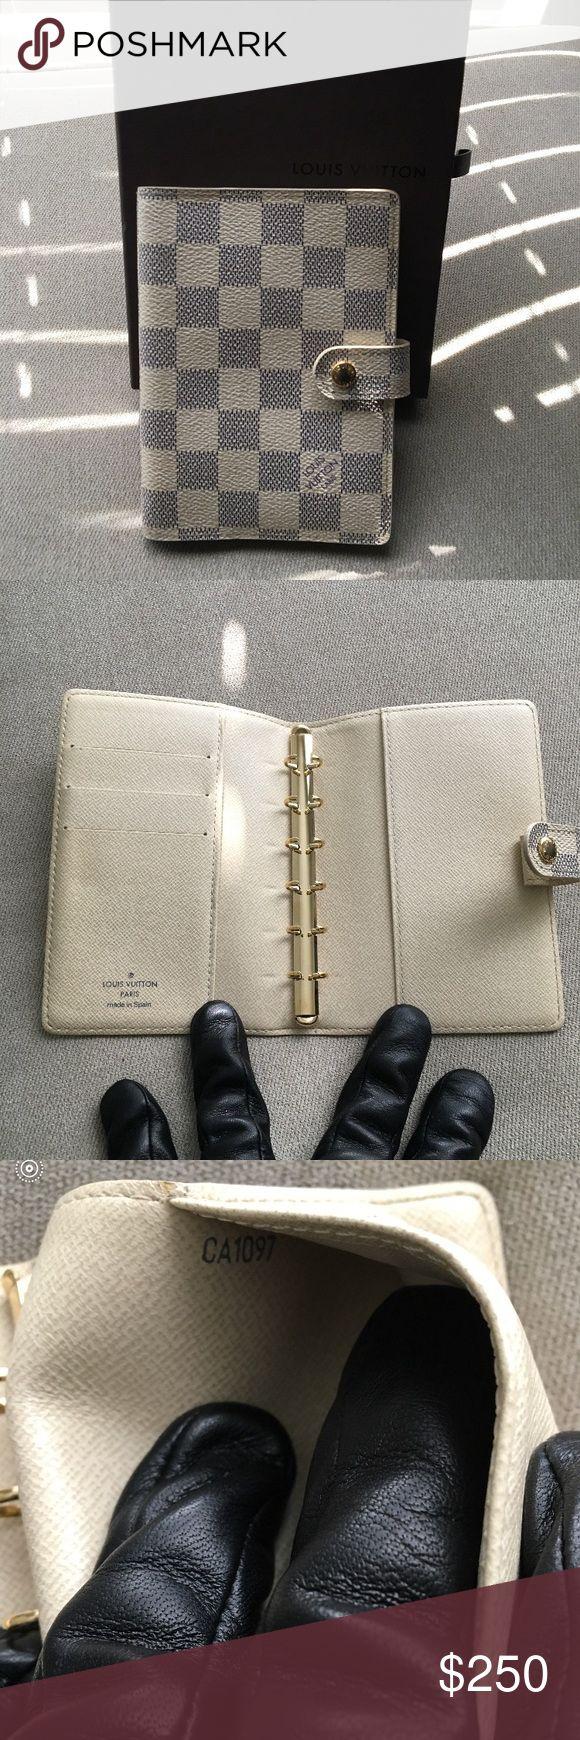 Louis Vuitton Agenda Louis Vuitton Damier Agenda. Made in Spain. No trades. 0.59X4.13X5.70.  Comes with Dust Bag Louis Vuitton Bags Travel Bags